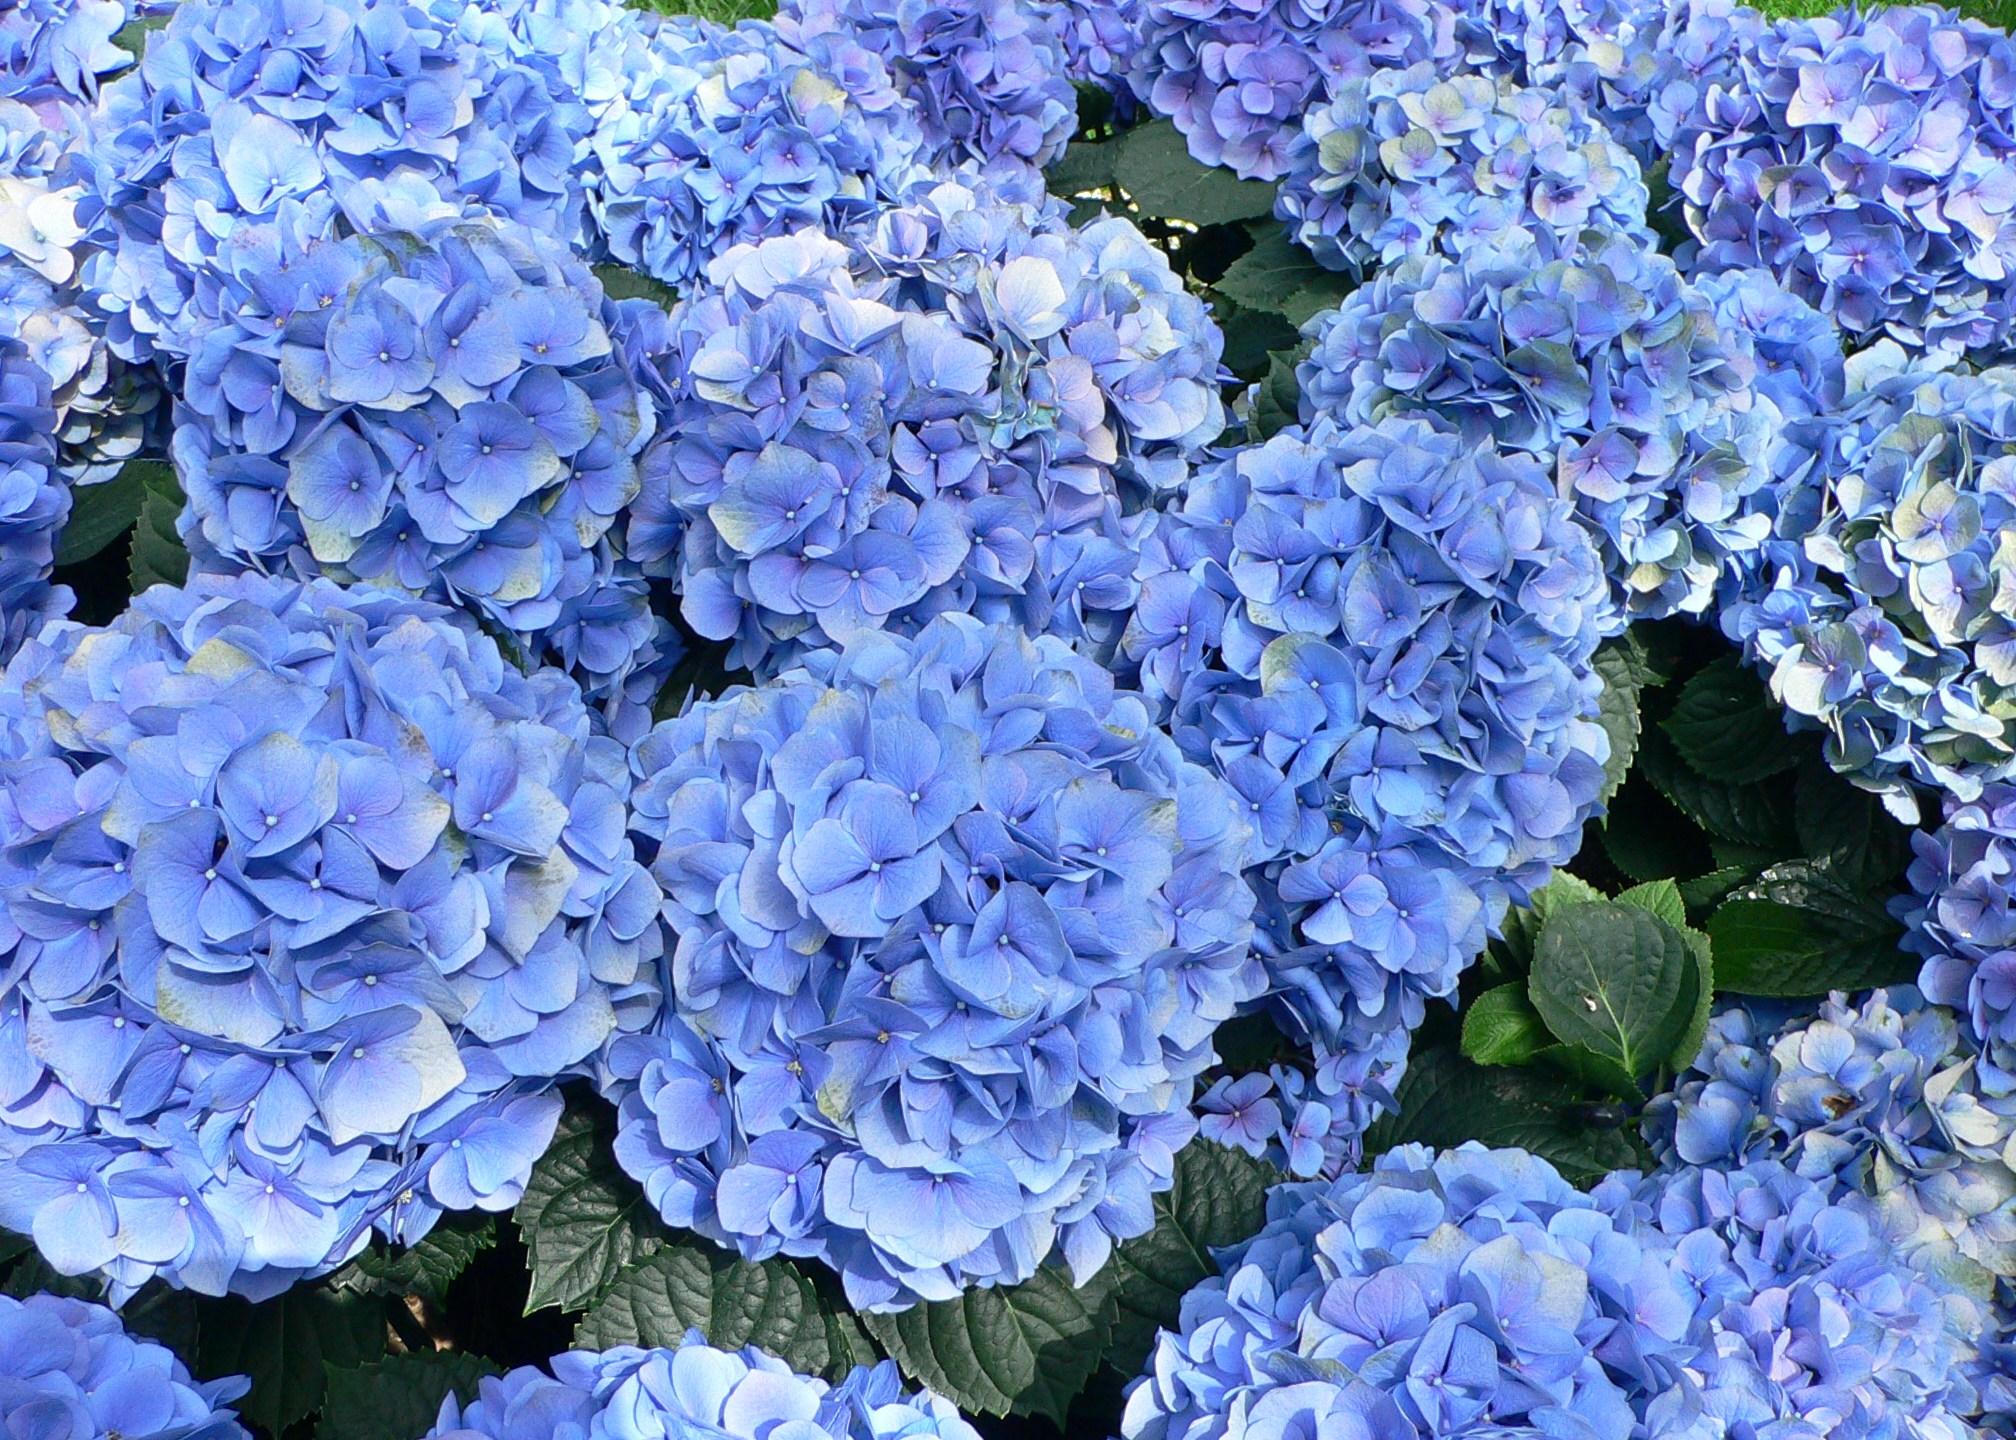 Hydrangea_macrophylla_-_Hortensia_hydrangea_1521626248528.jpg